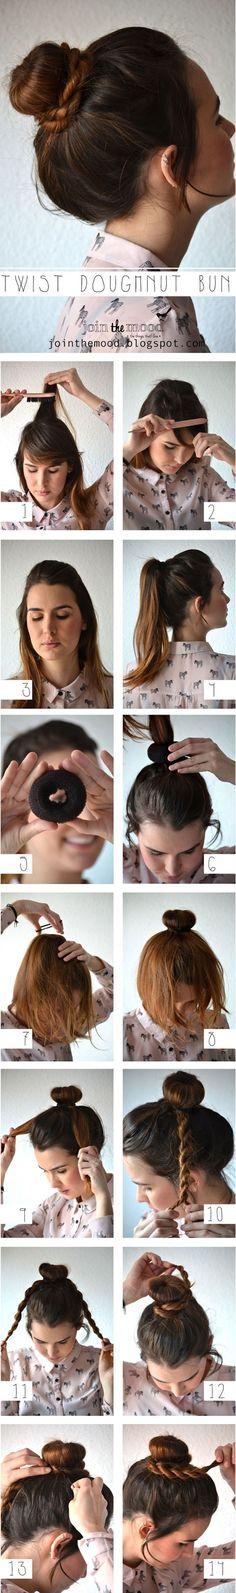 How to make the twist doughnut bun